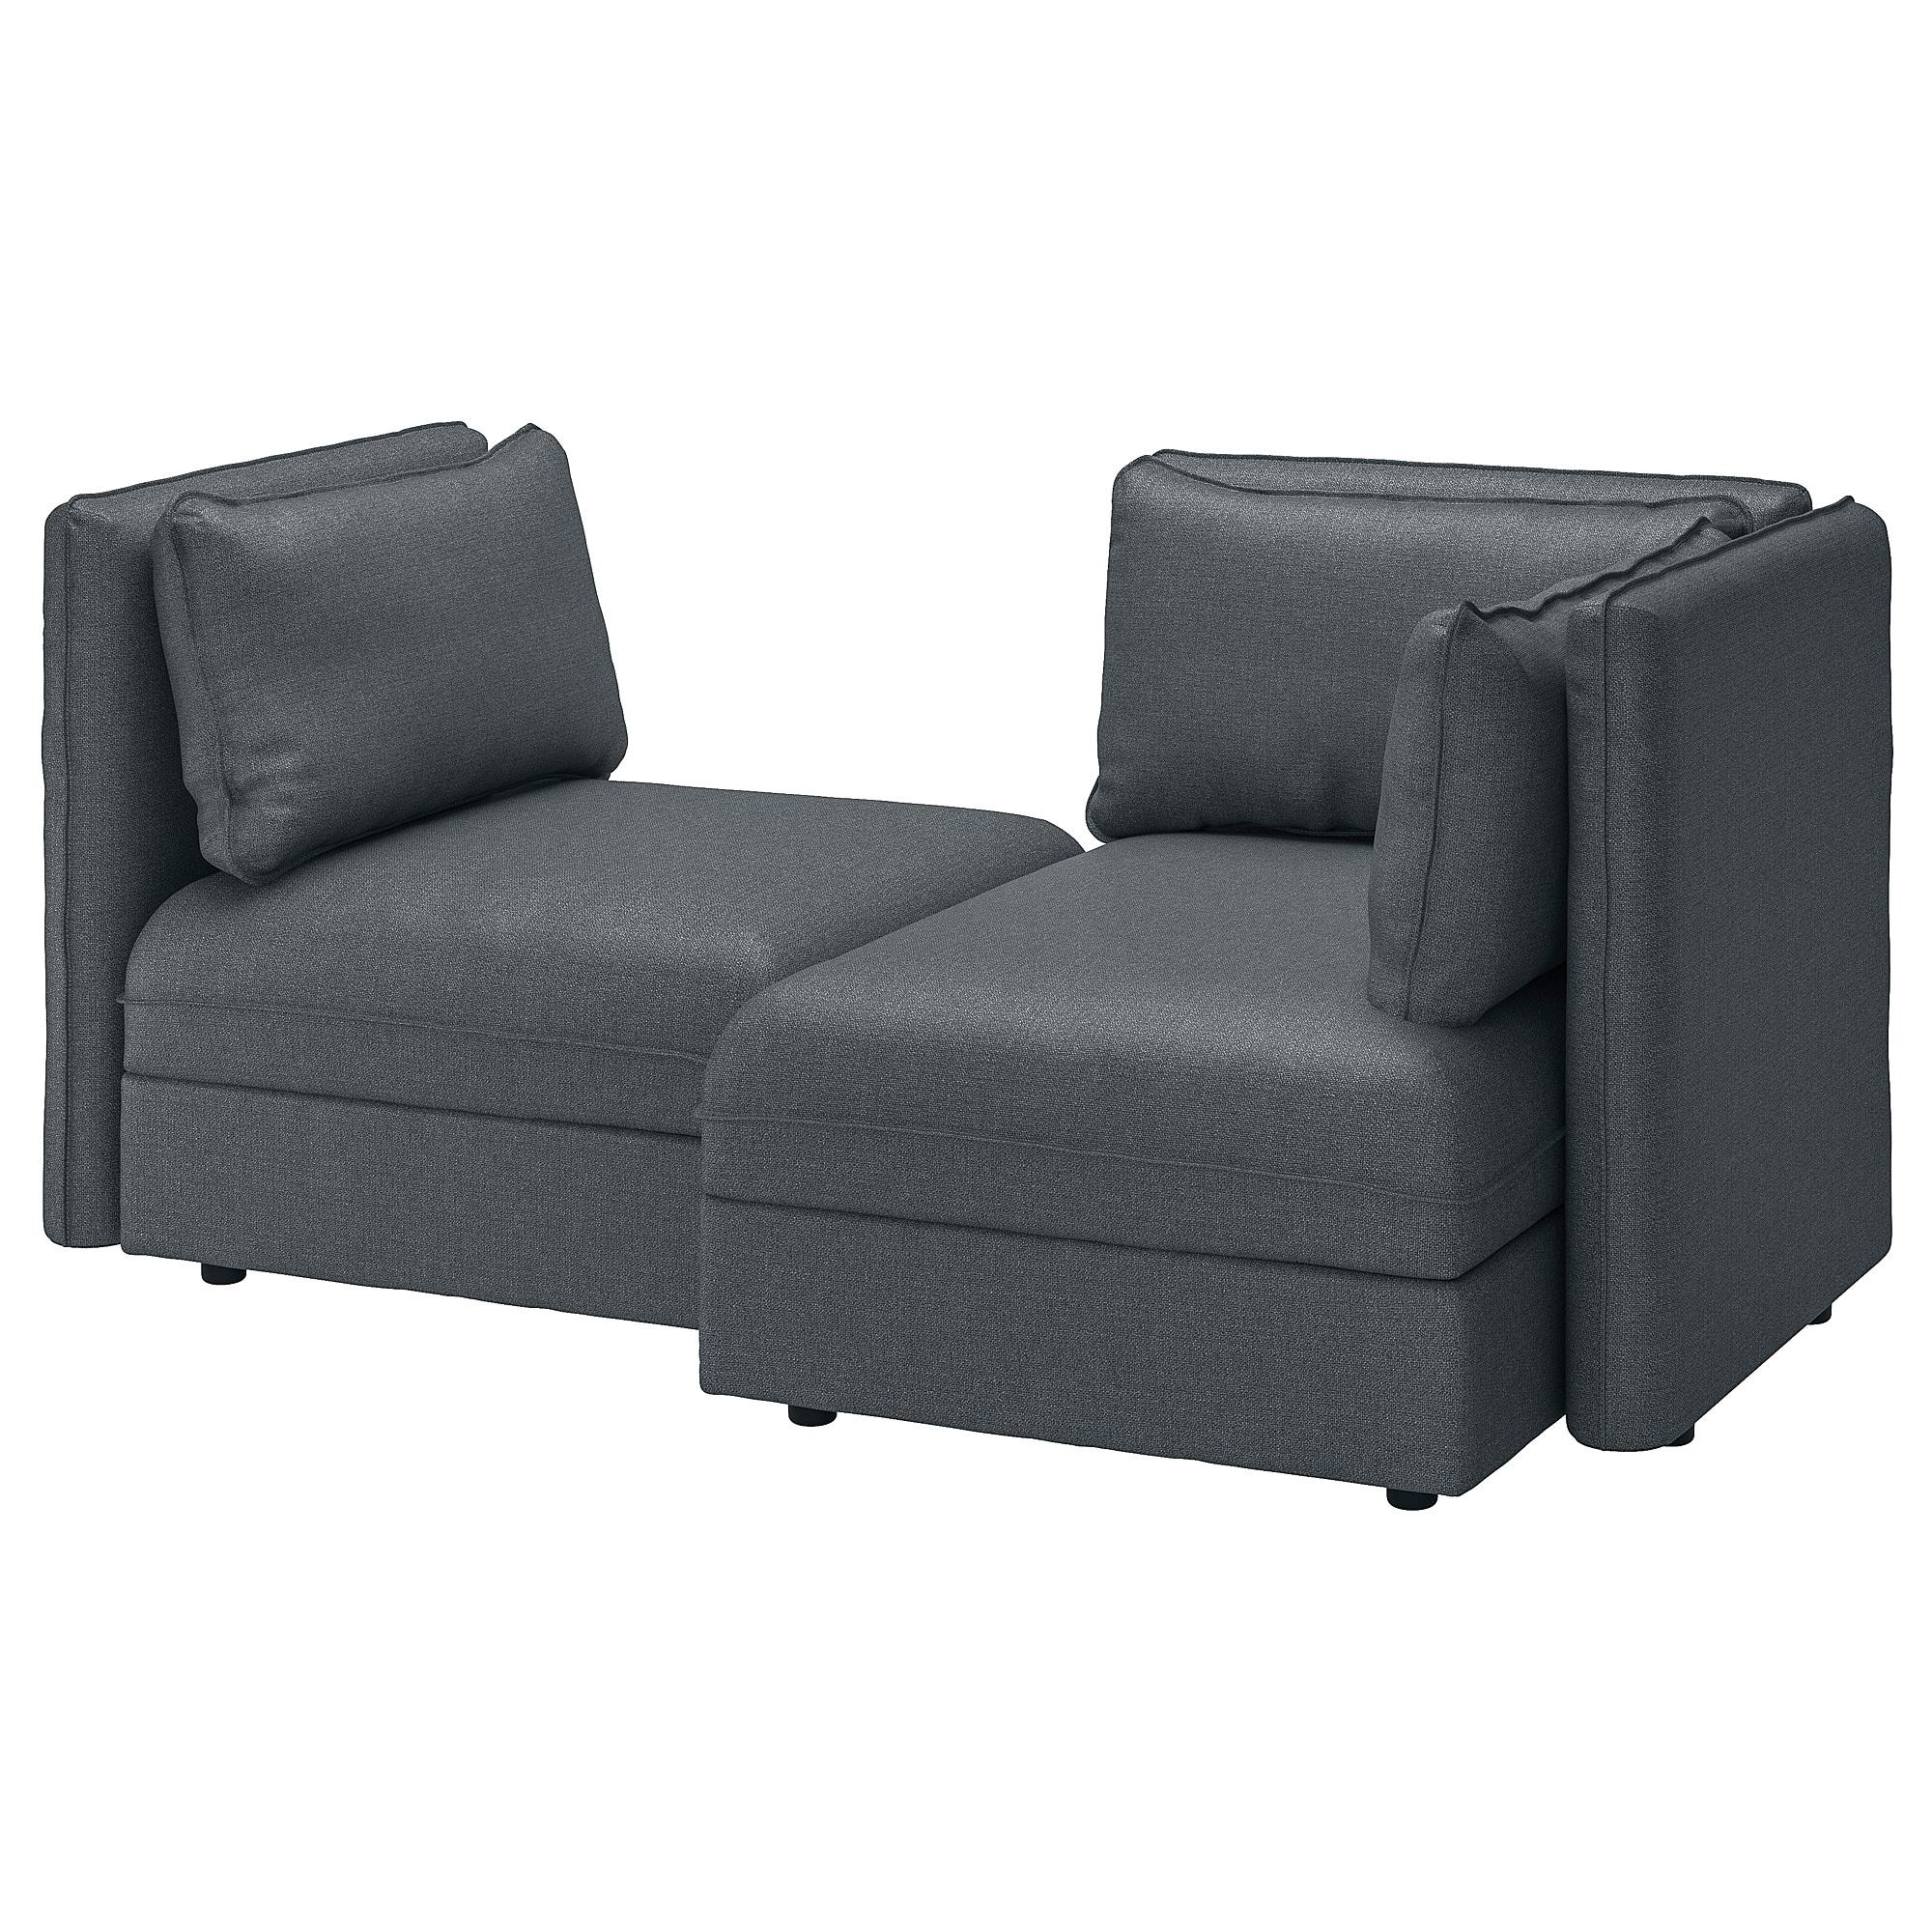 2-местный модульный диван ВАЛЛЕНТУНА, Хилларед, Хилларед темно-серый